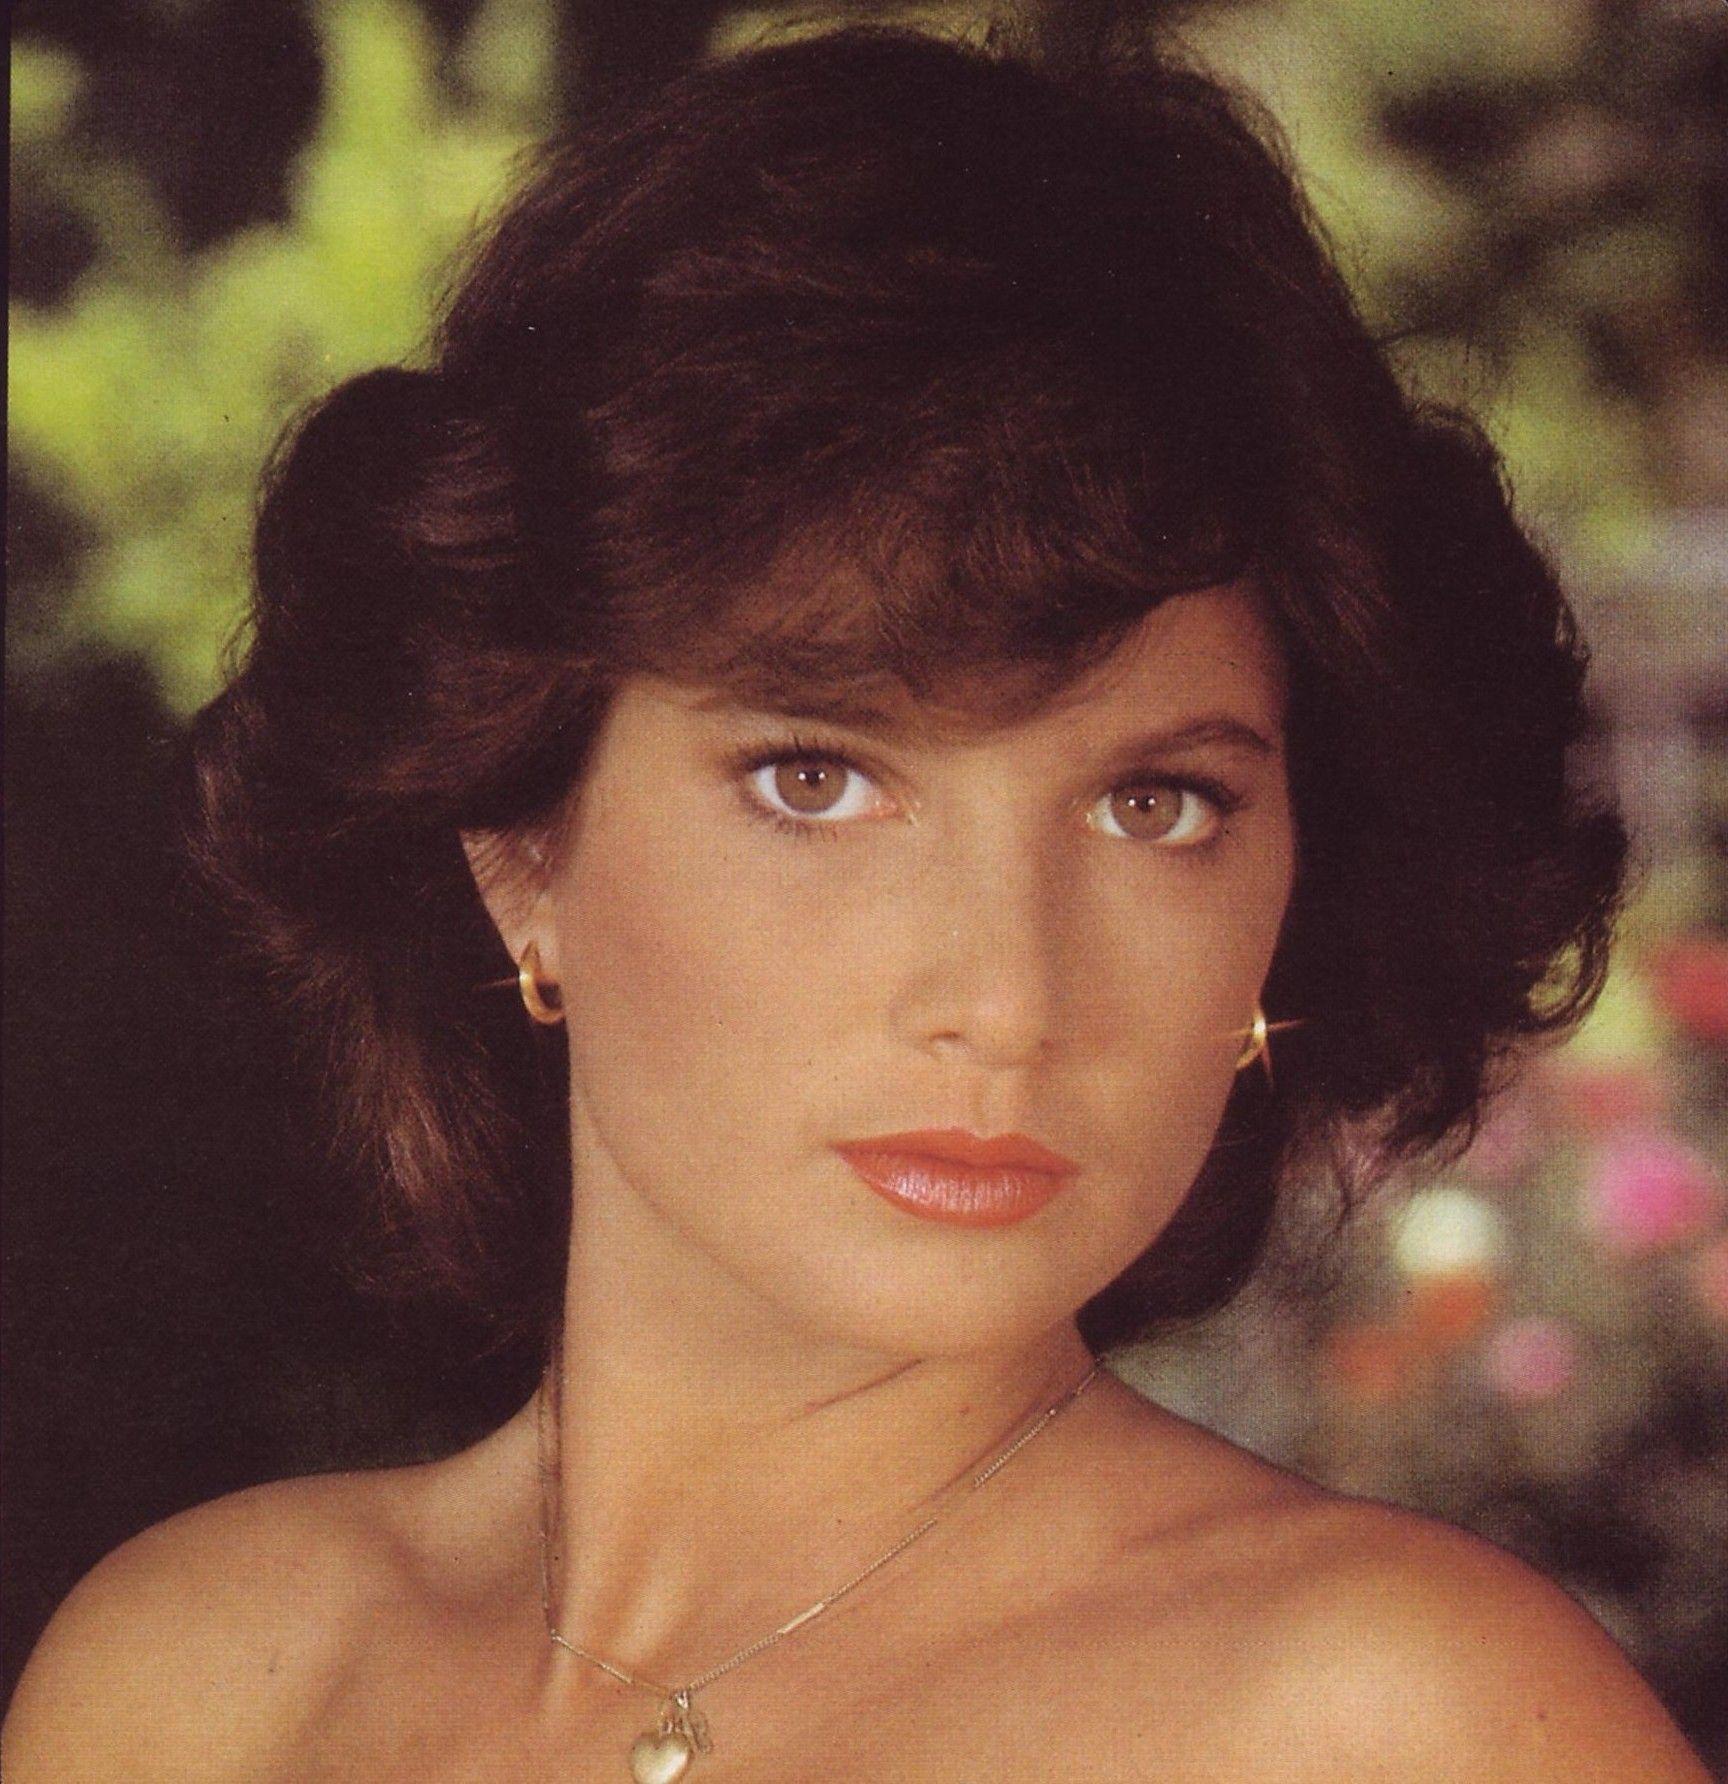 Anna Ventura 80s | Famous, Lady, 80s